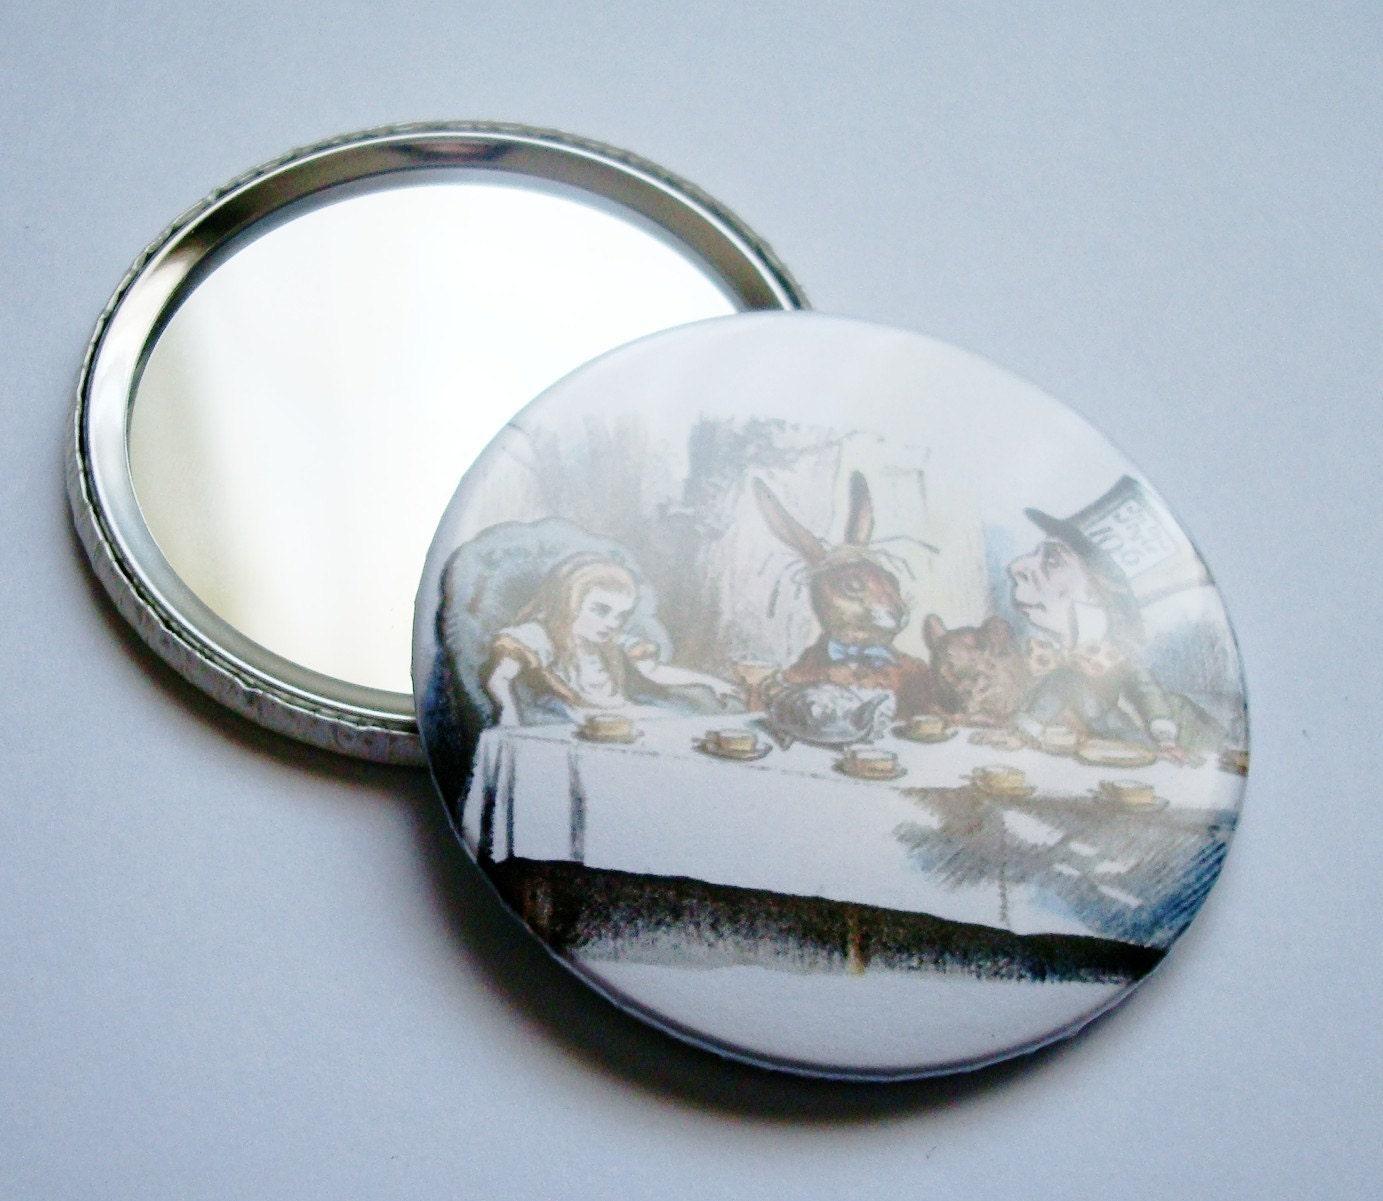 Tu bisuter a pupettas espejo de bolsillo alice in wonderland tea party - Espejos de bolsillo ...